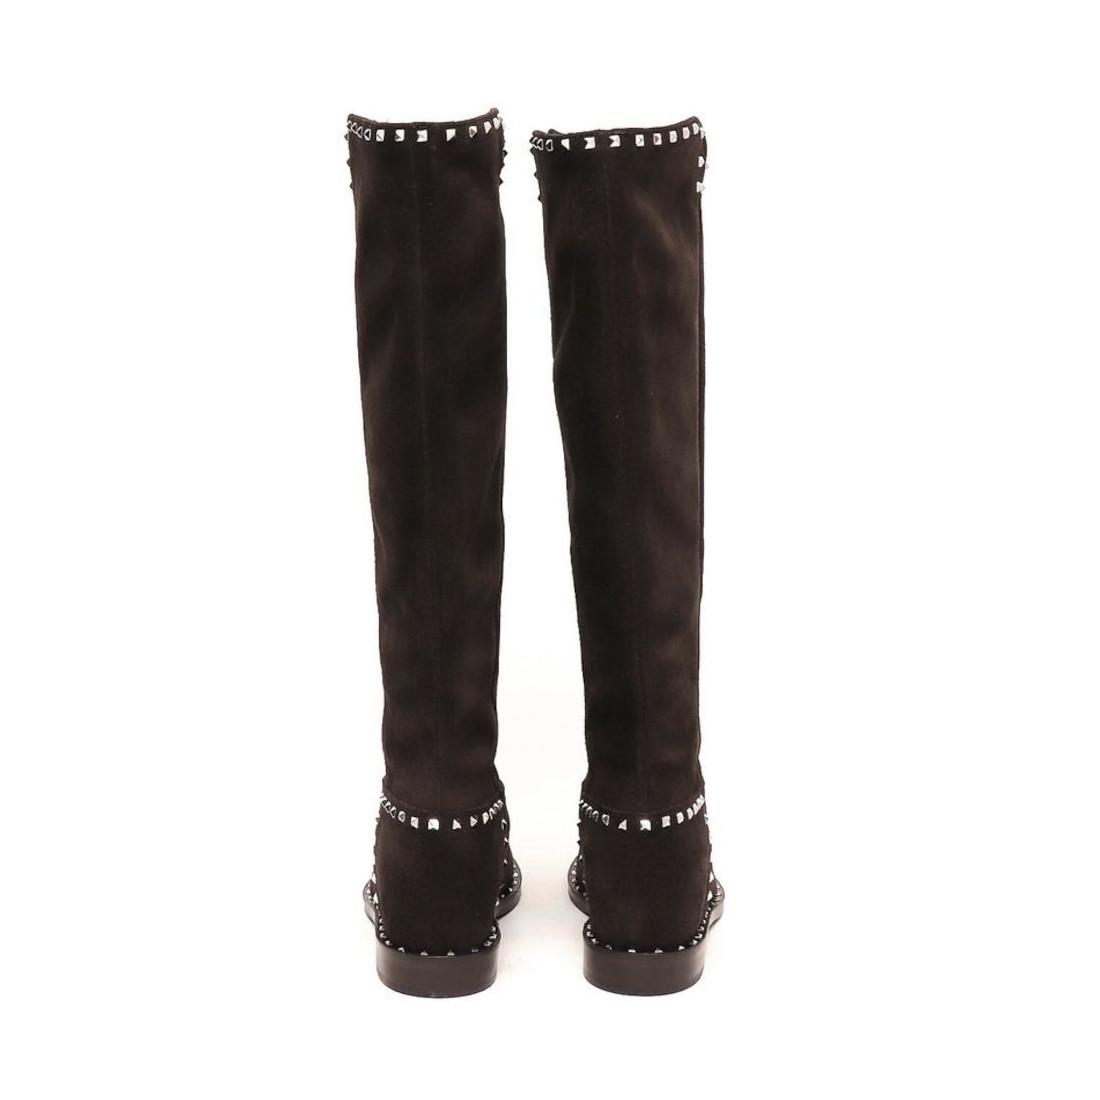 boots woman via roma 15 2852velour 7648